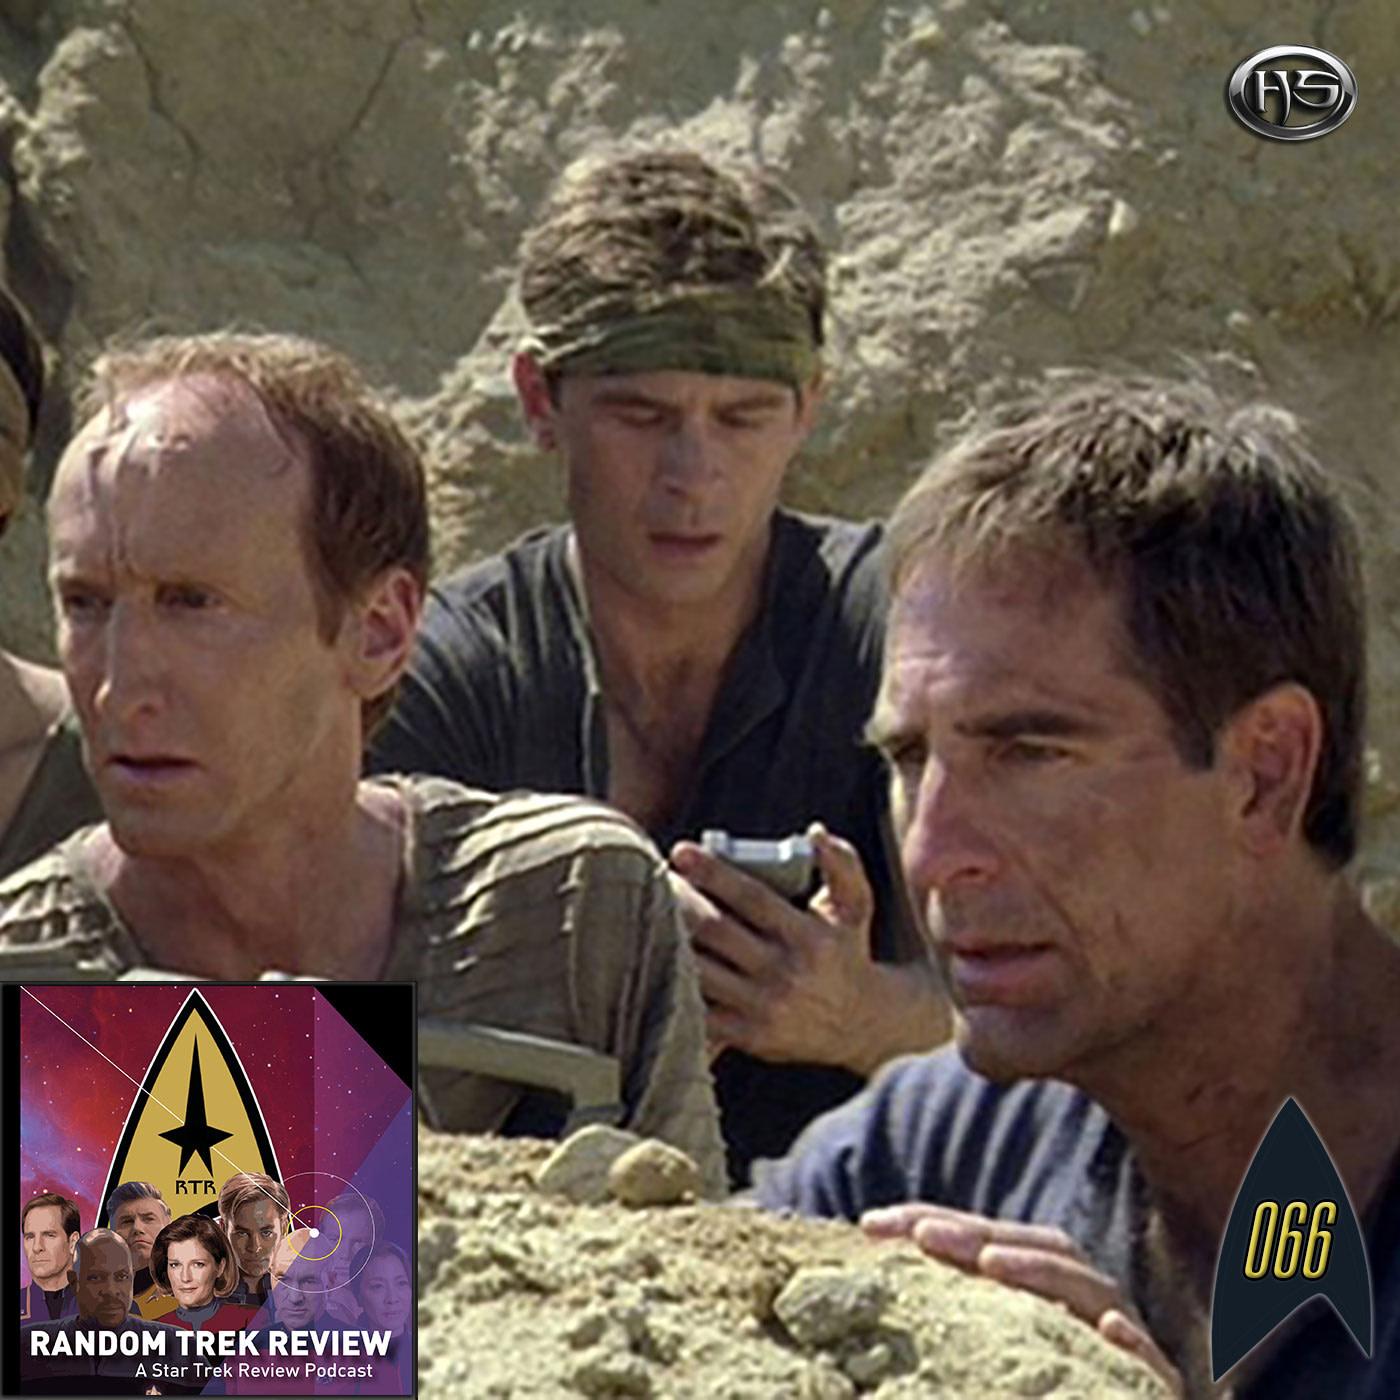 Random Trek Review Episode 66